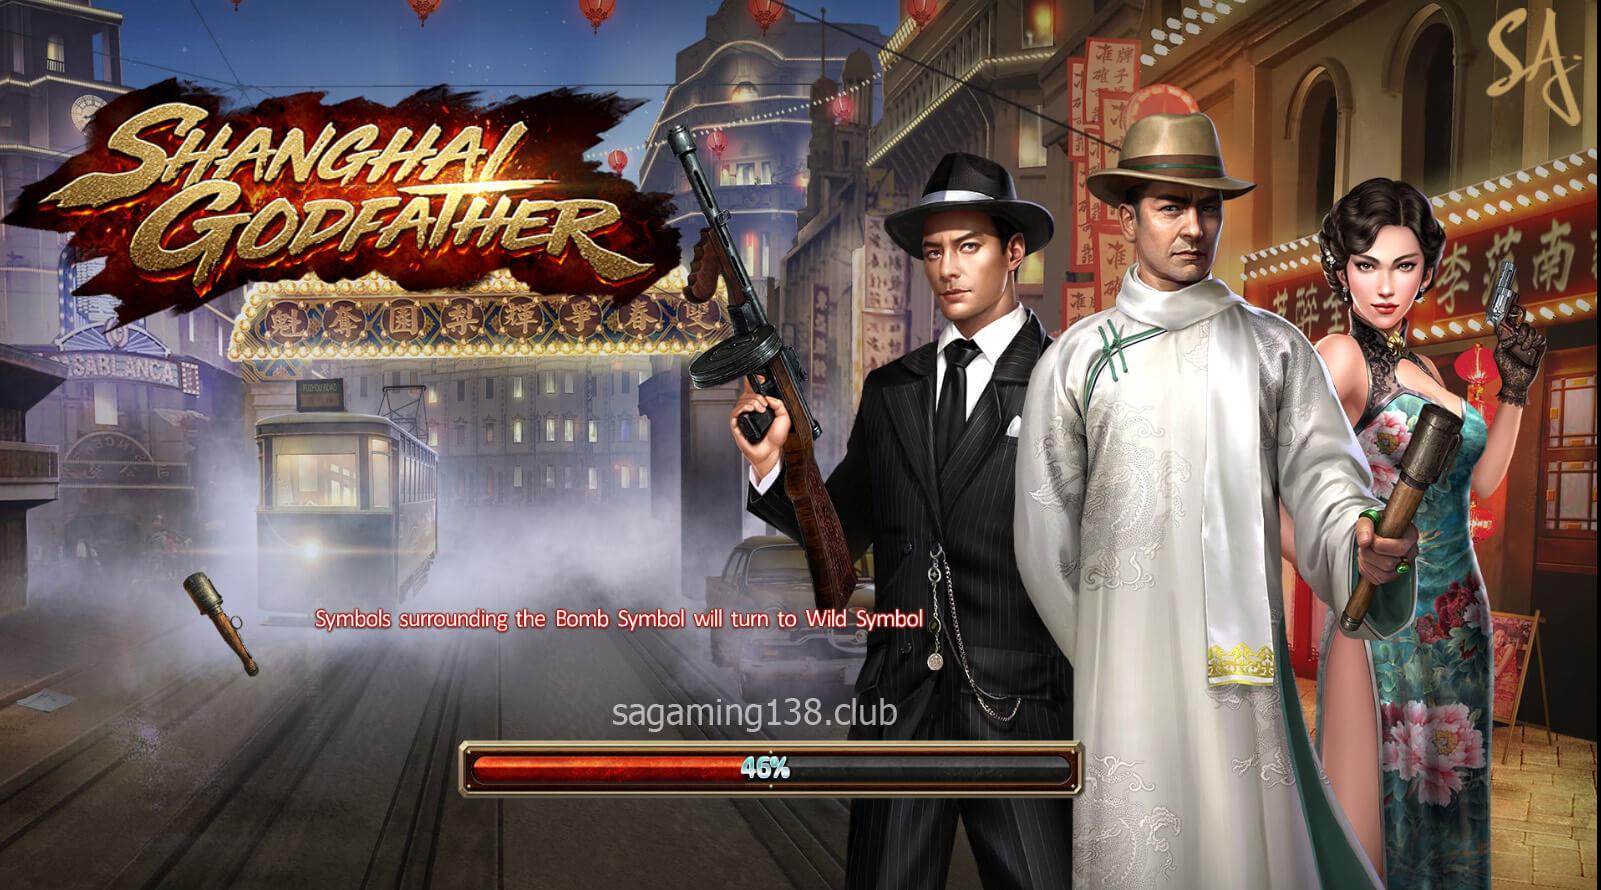 Shanghai Godfather เกมสล็อตออนไลน์ 4 SA Gaming คาสิโนออนไลน์ที่ดีที่สุด